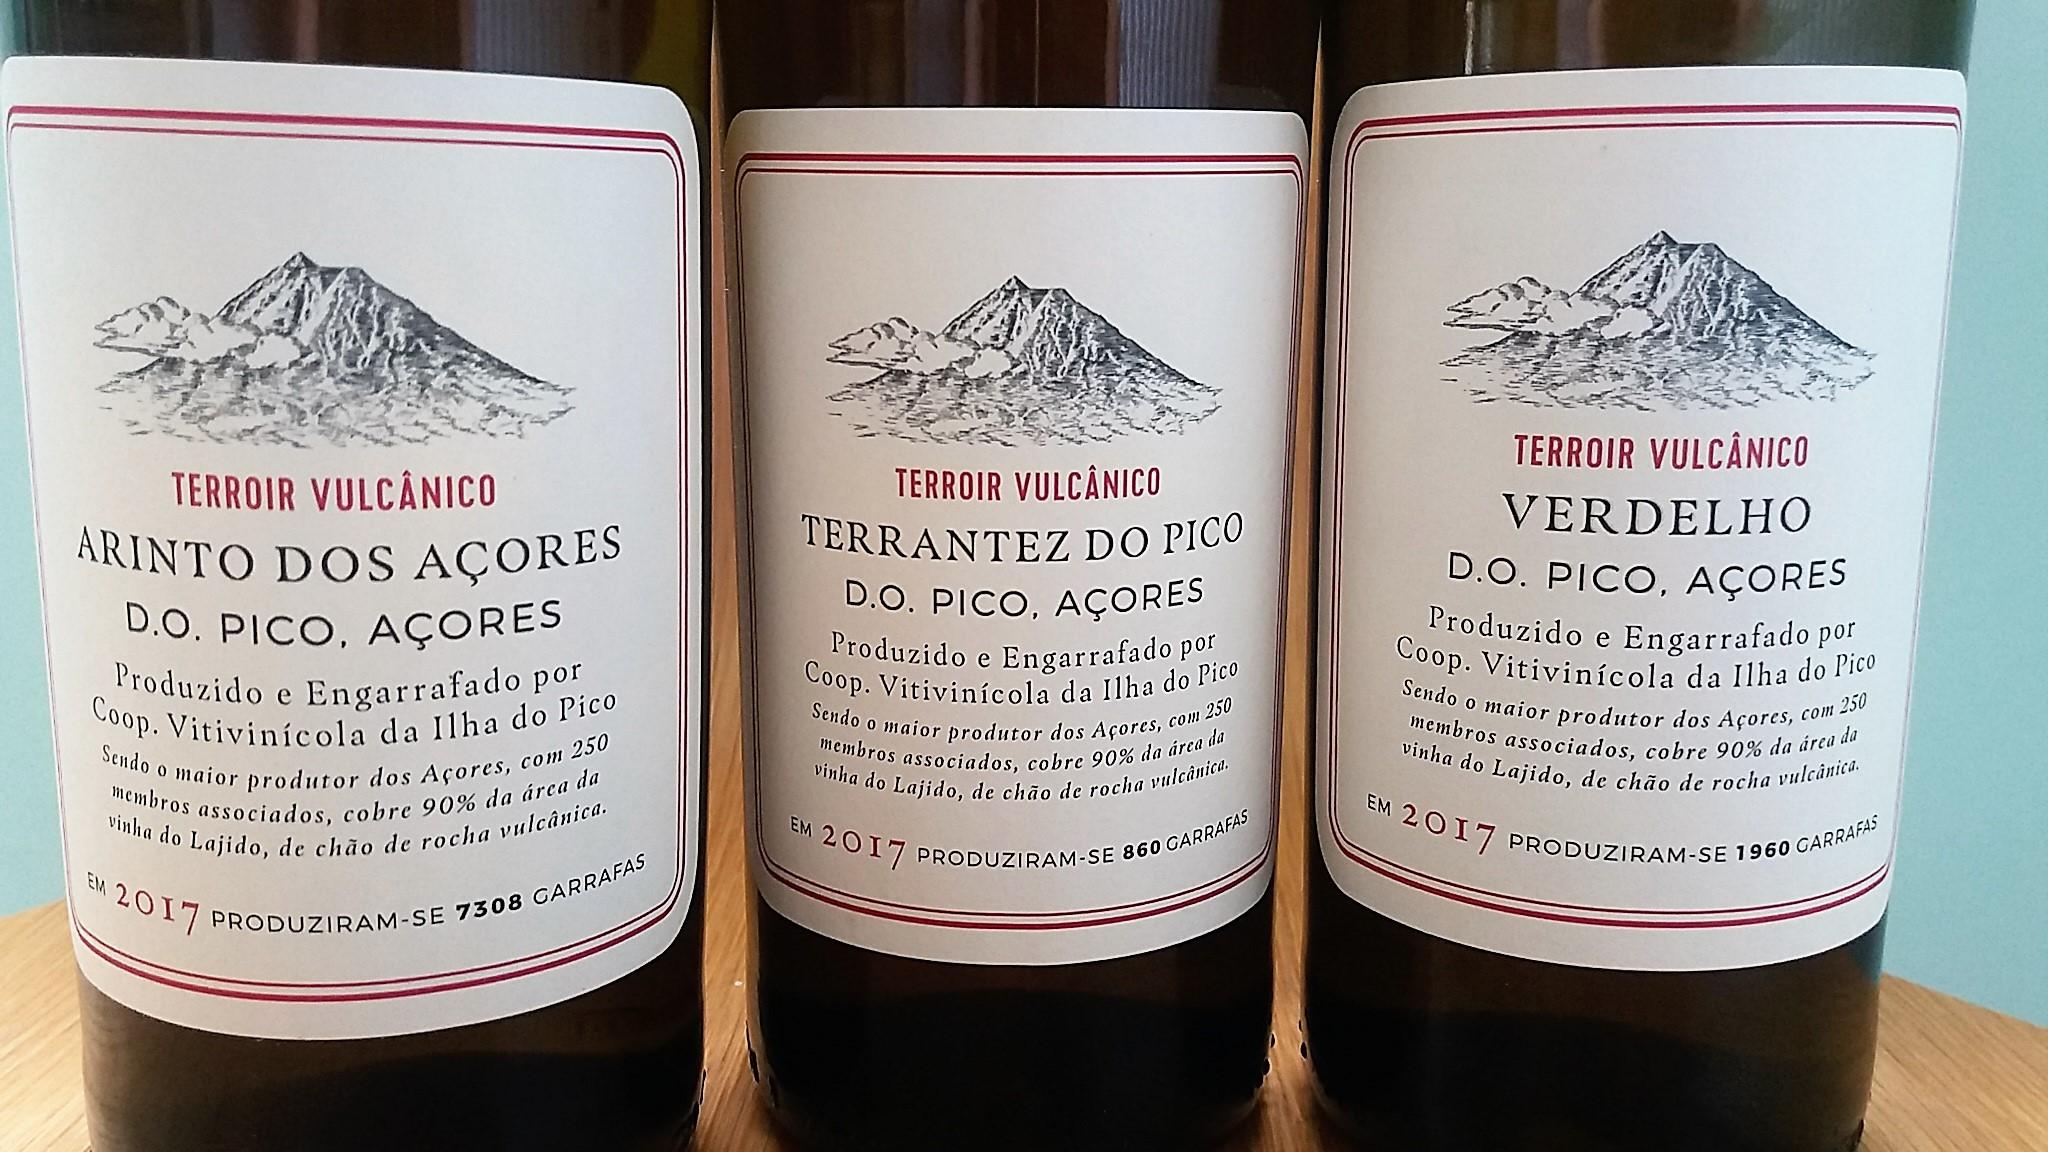 Pico wine